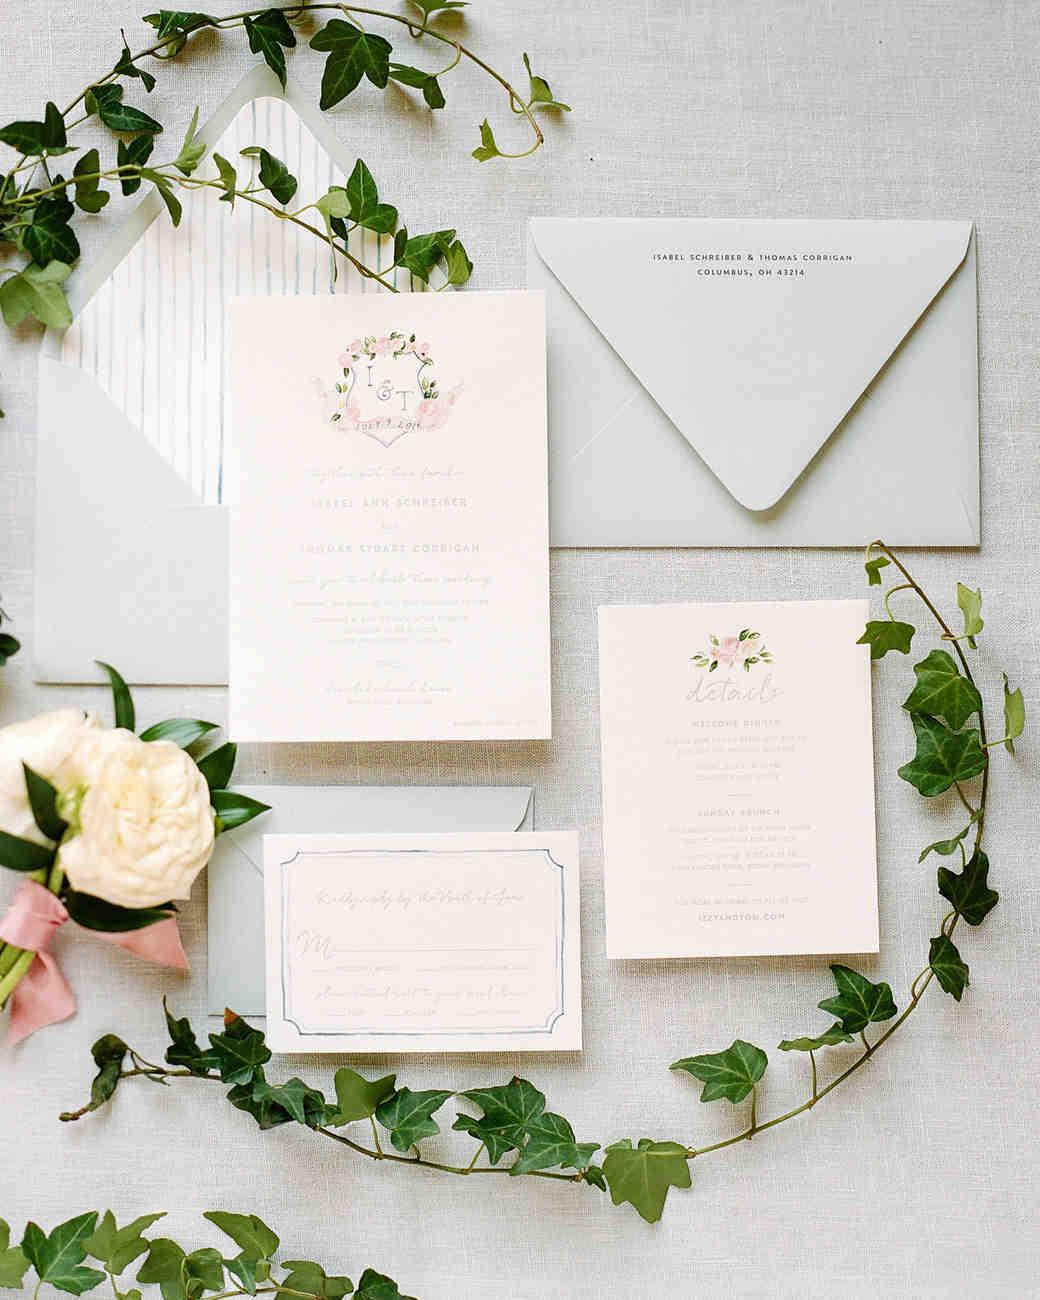 top wedding invitations016%0A summer wedding invitations    summer wedding invitations izzy tom wedding  invite